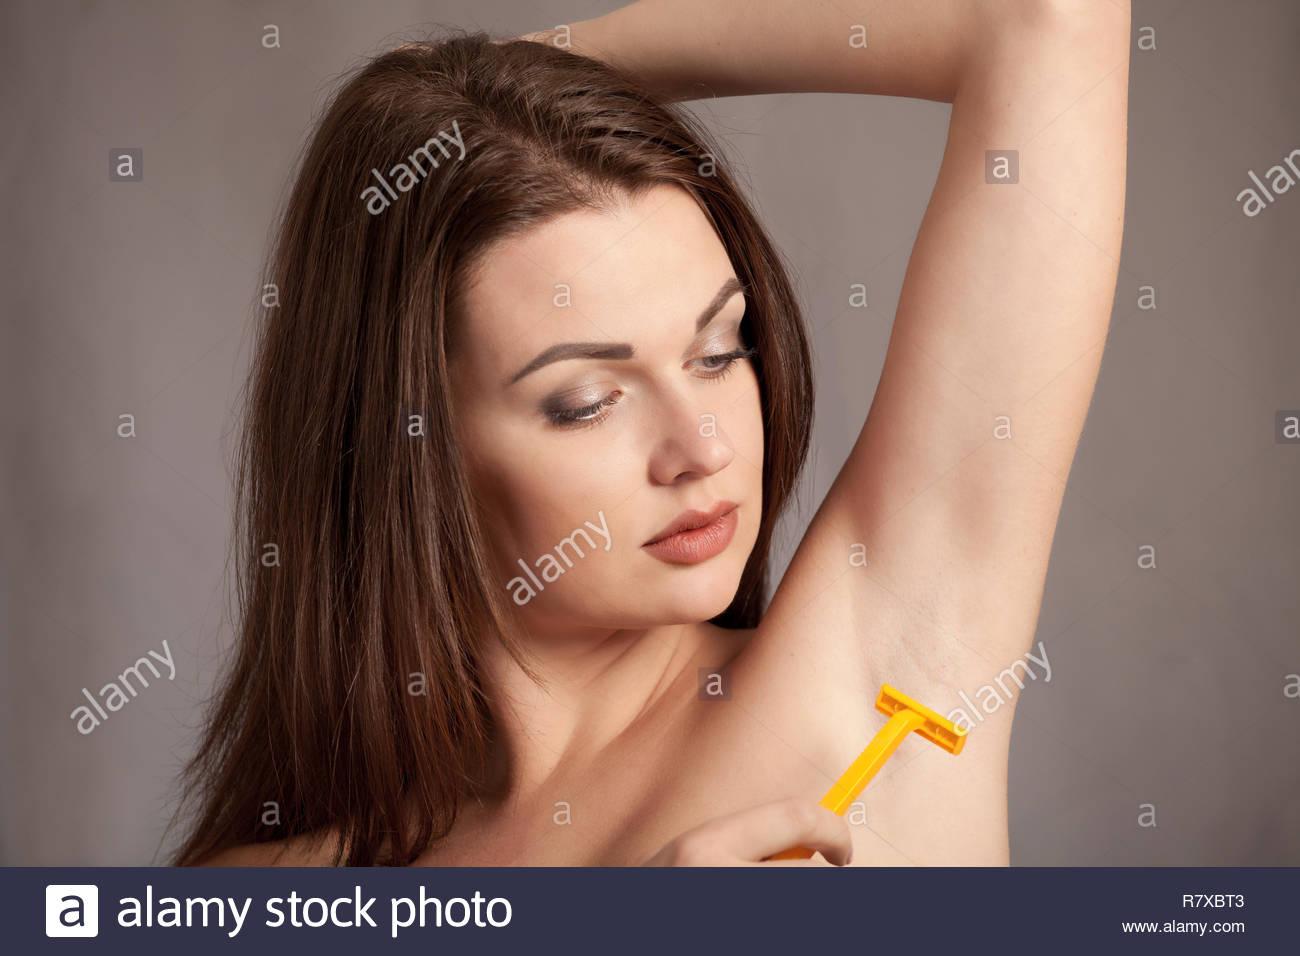 Young woman armpit depilation, epilation, shaving with razor - Stock Image